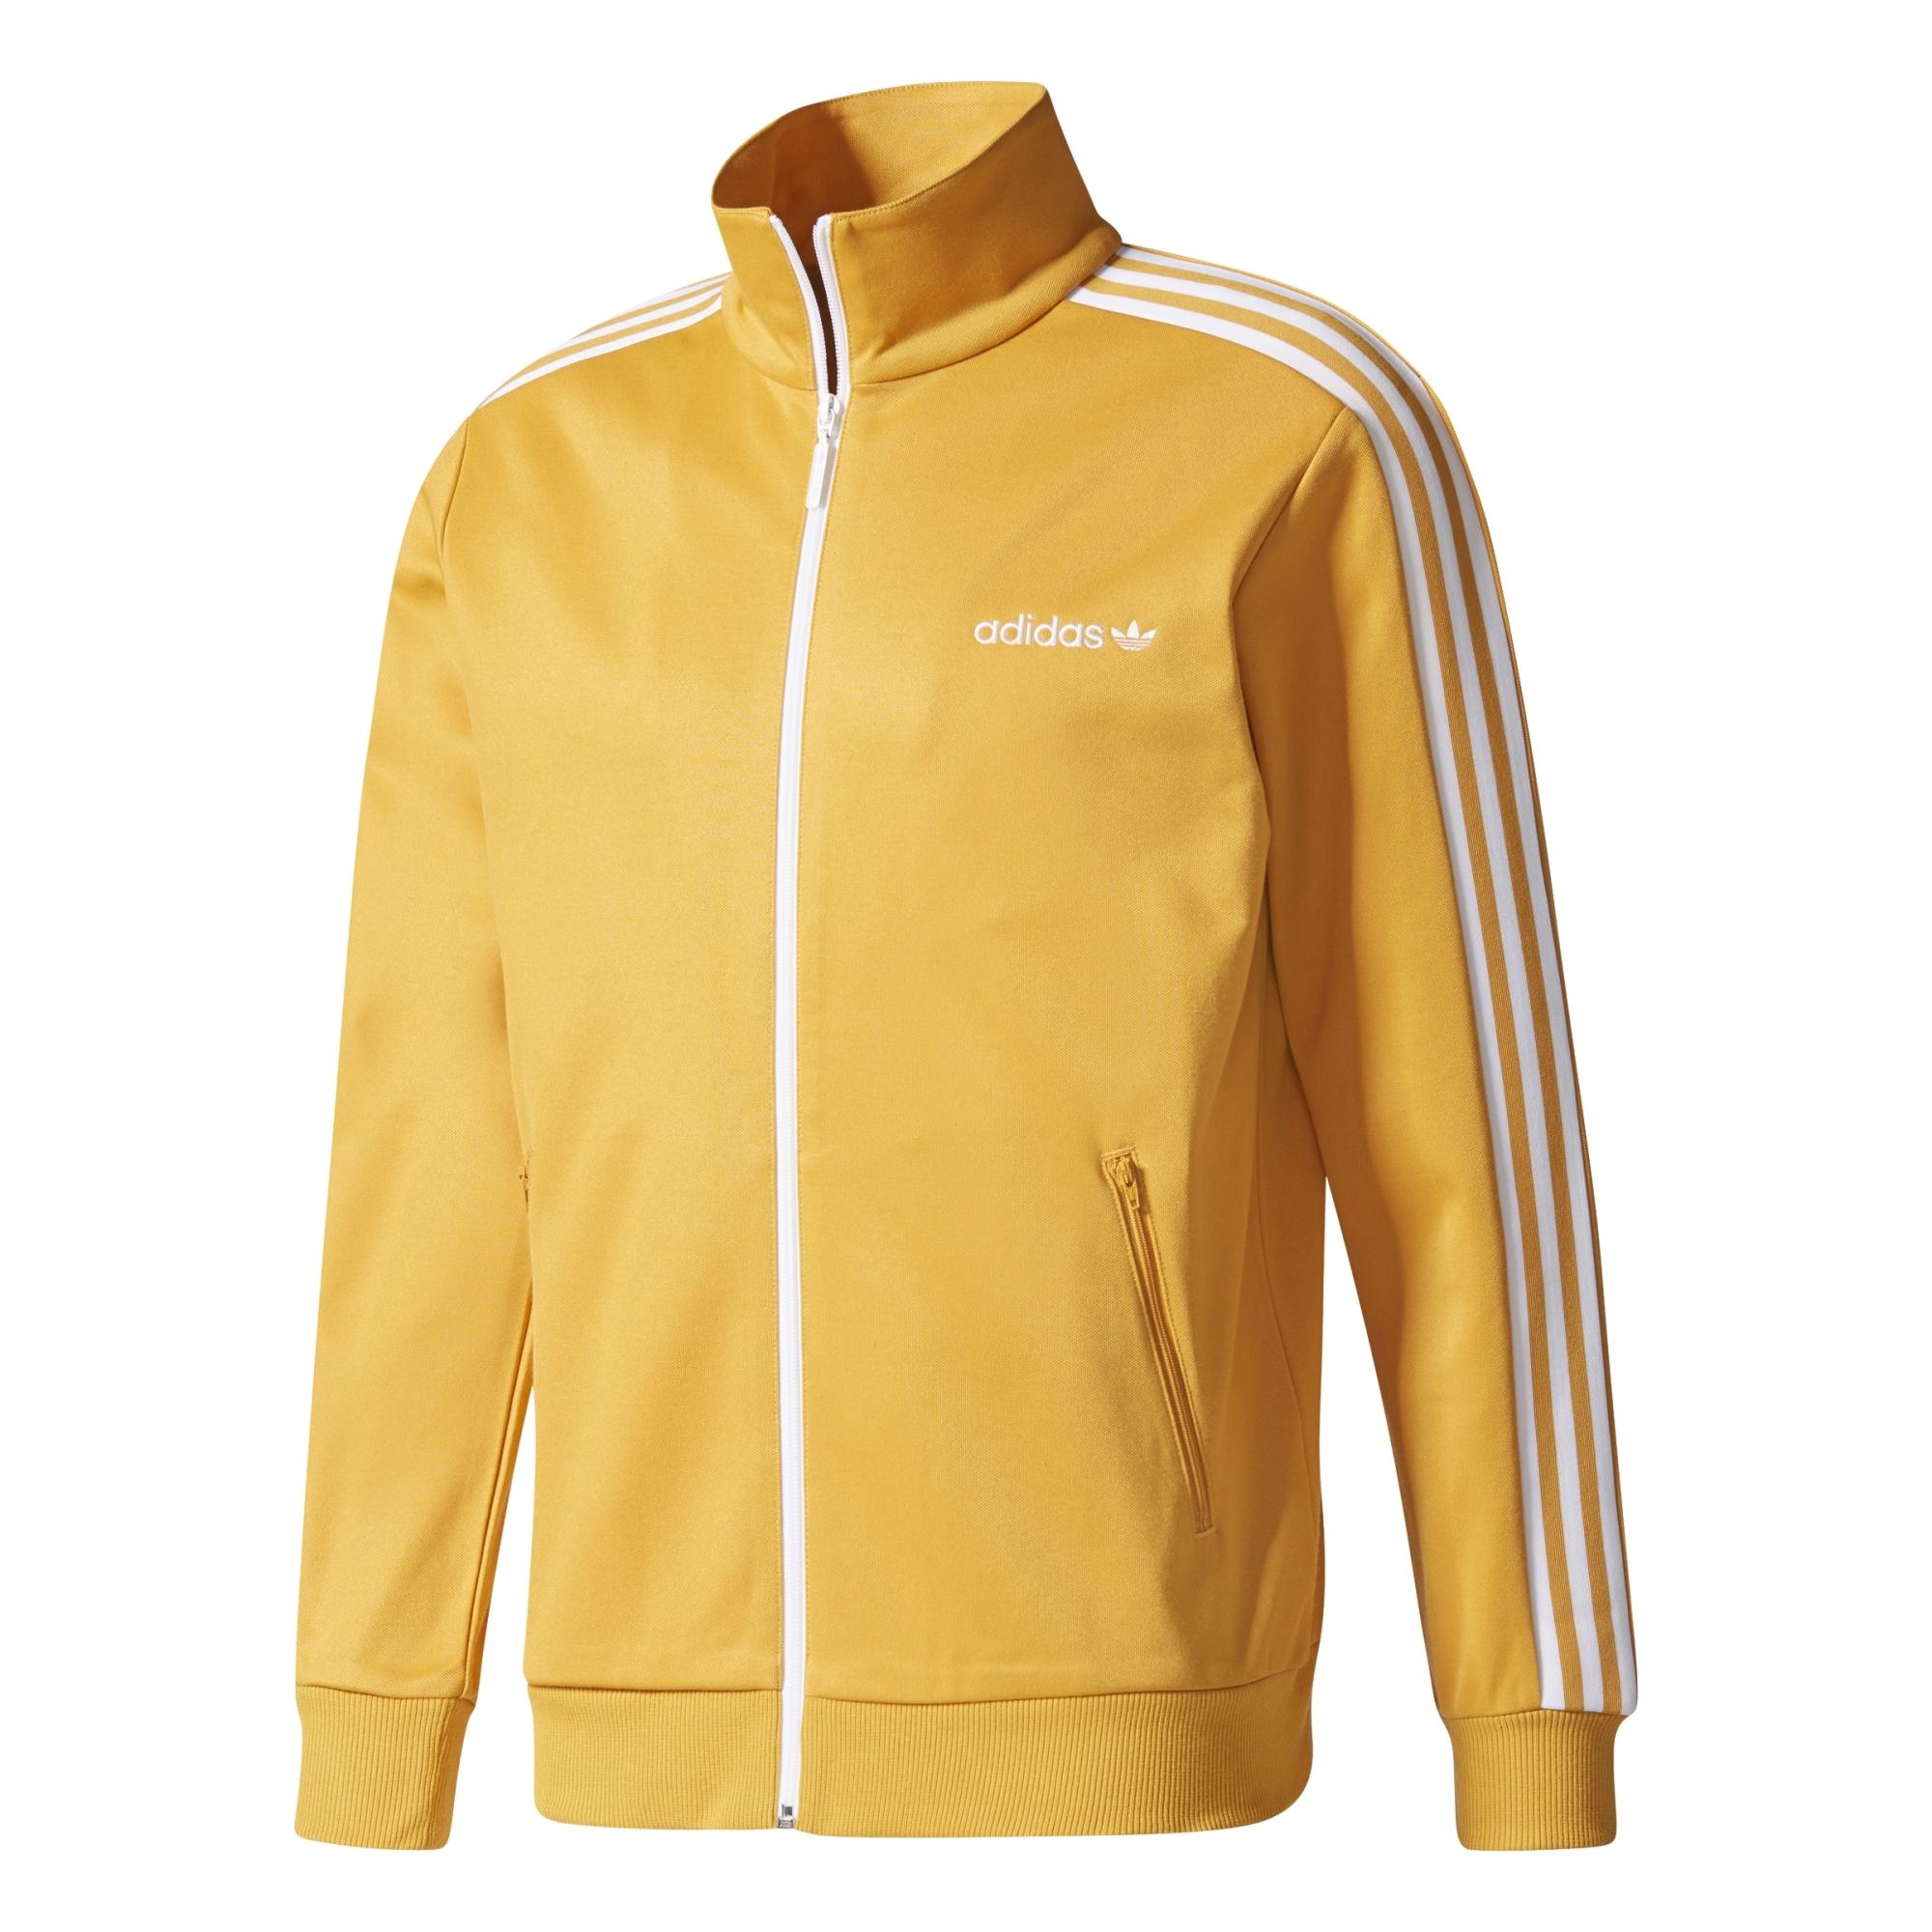 Adidas Originals Top Yellow Beckenbauer Track tactile TvTwPqBa